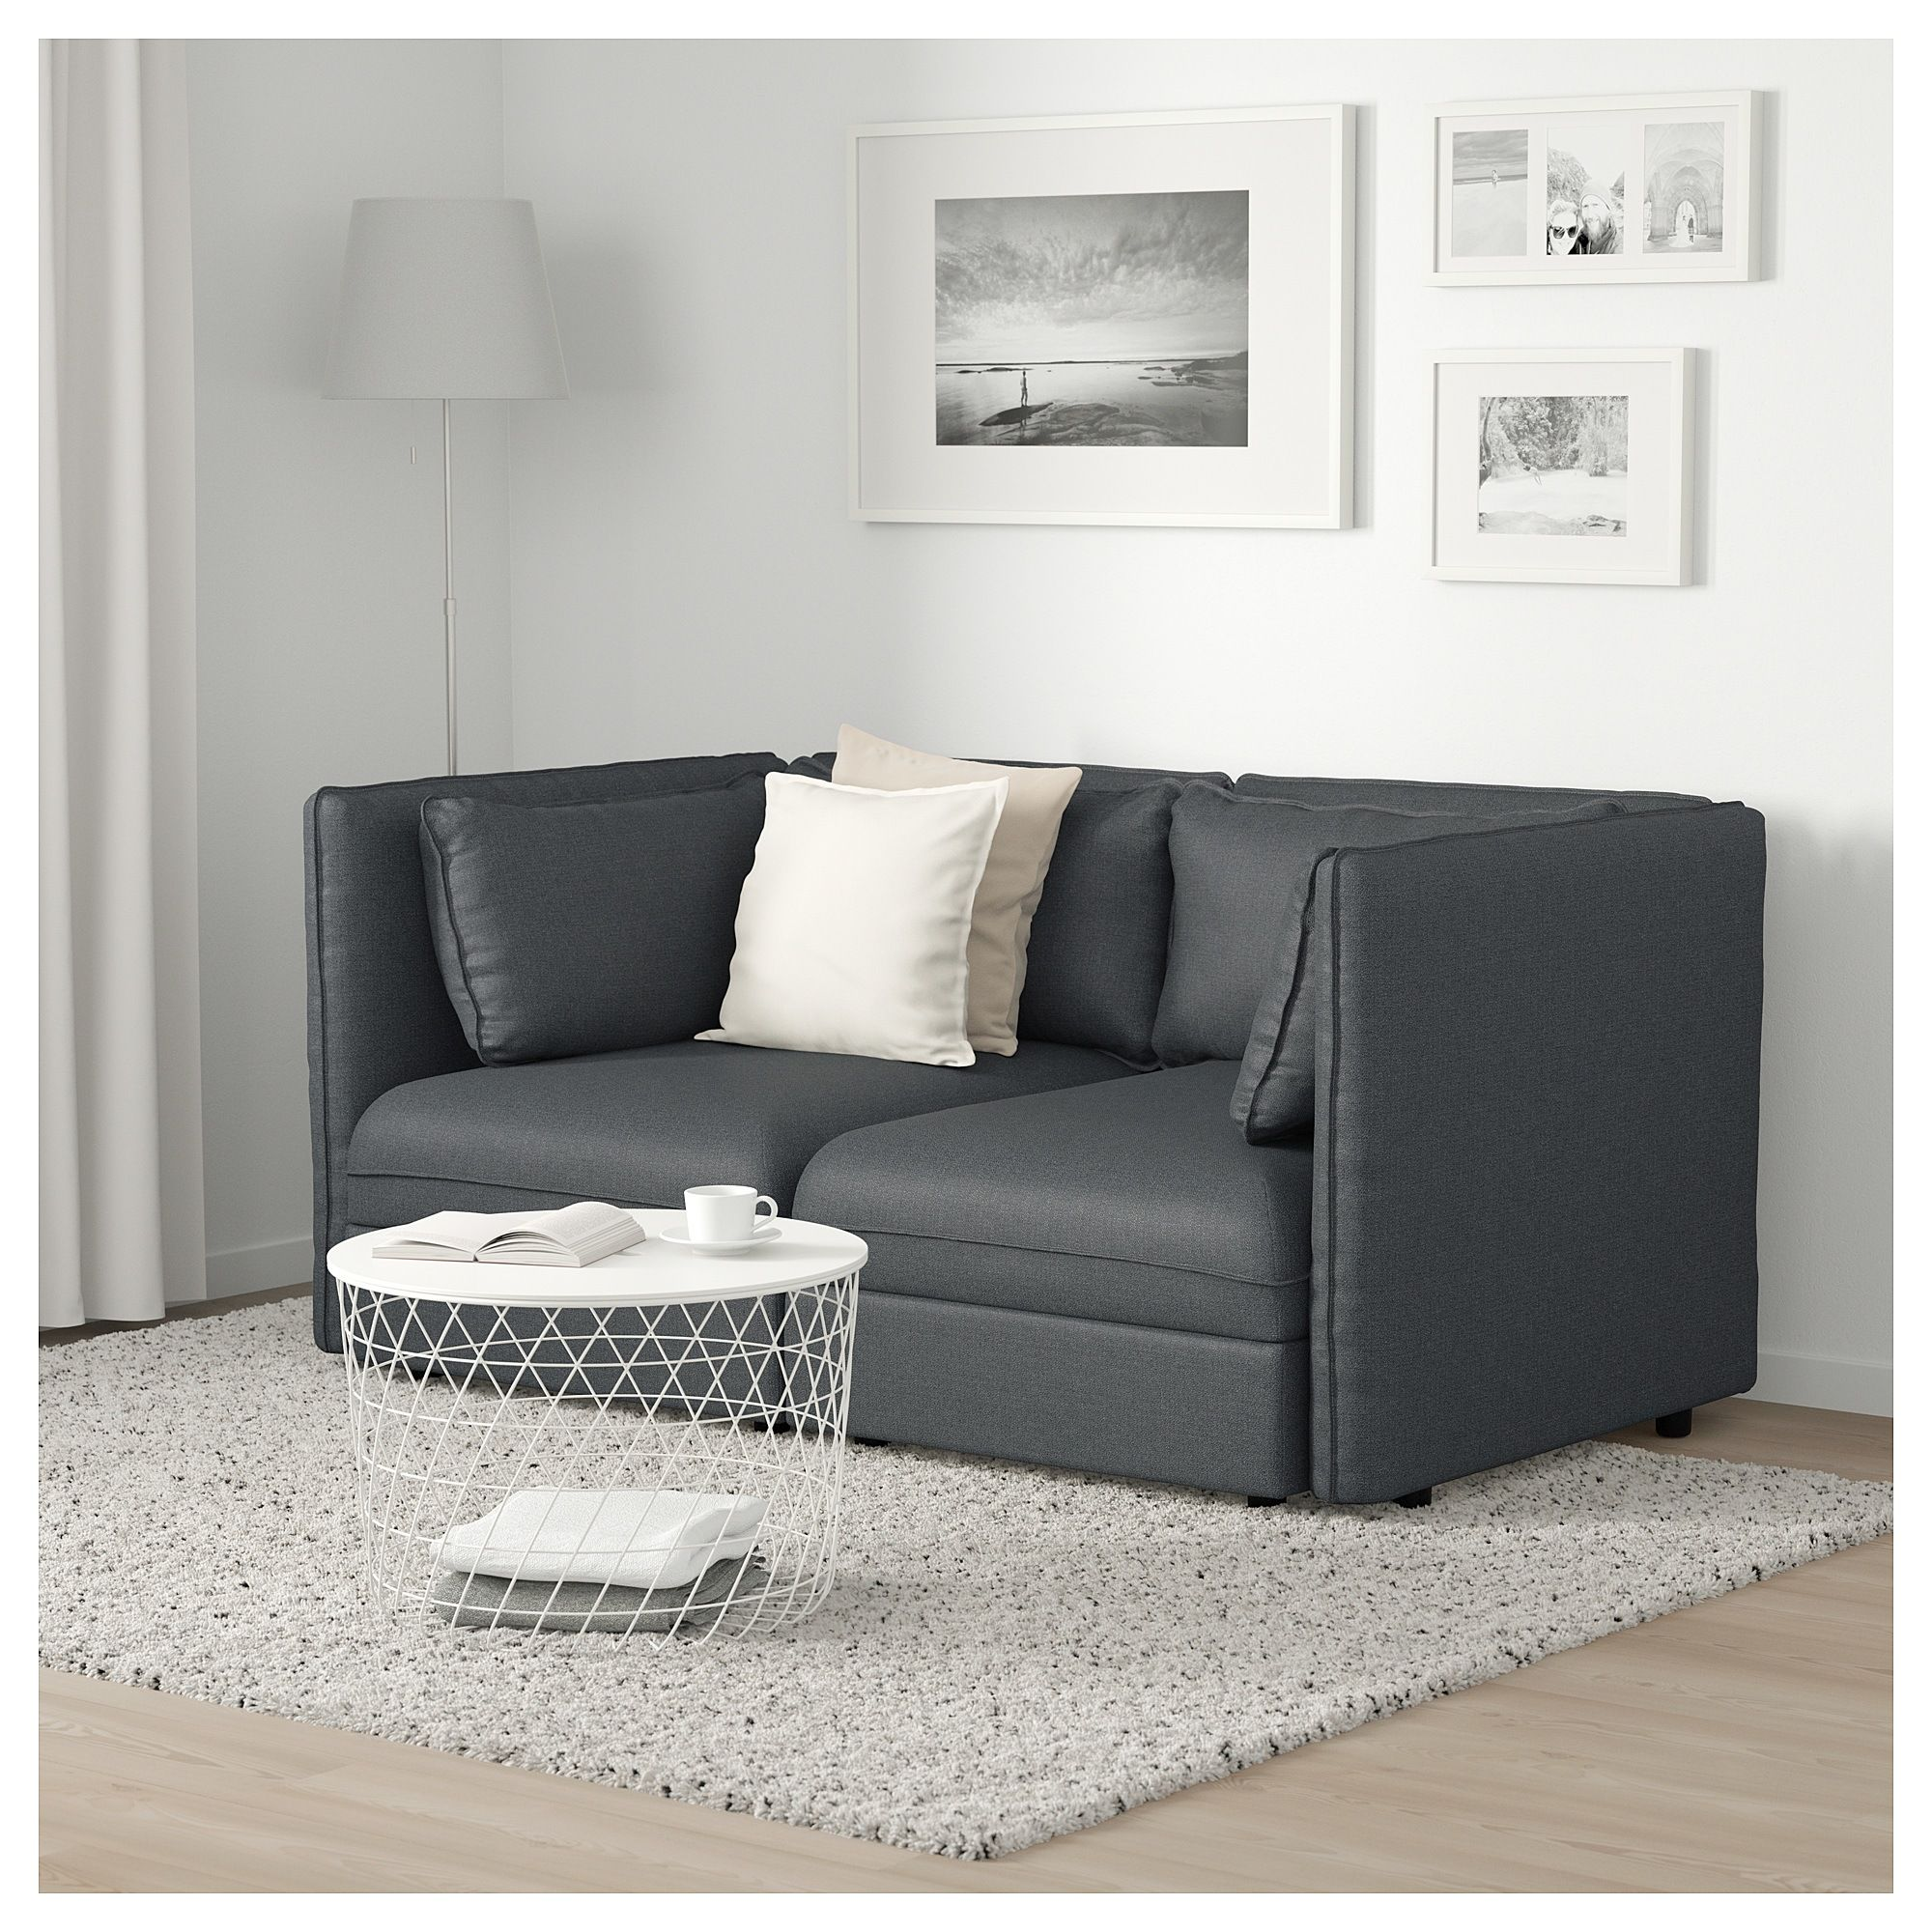 IKEA VALLENTUNA Modular loveseat Hillared dark gray